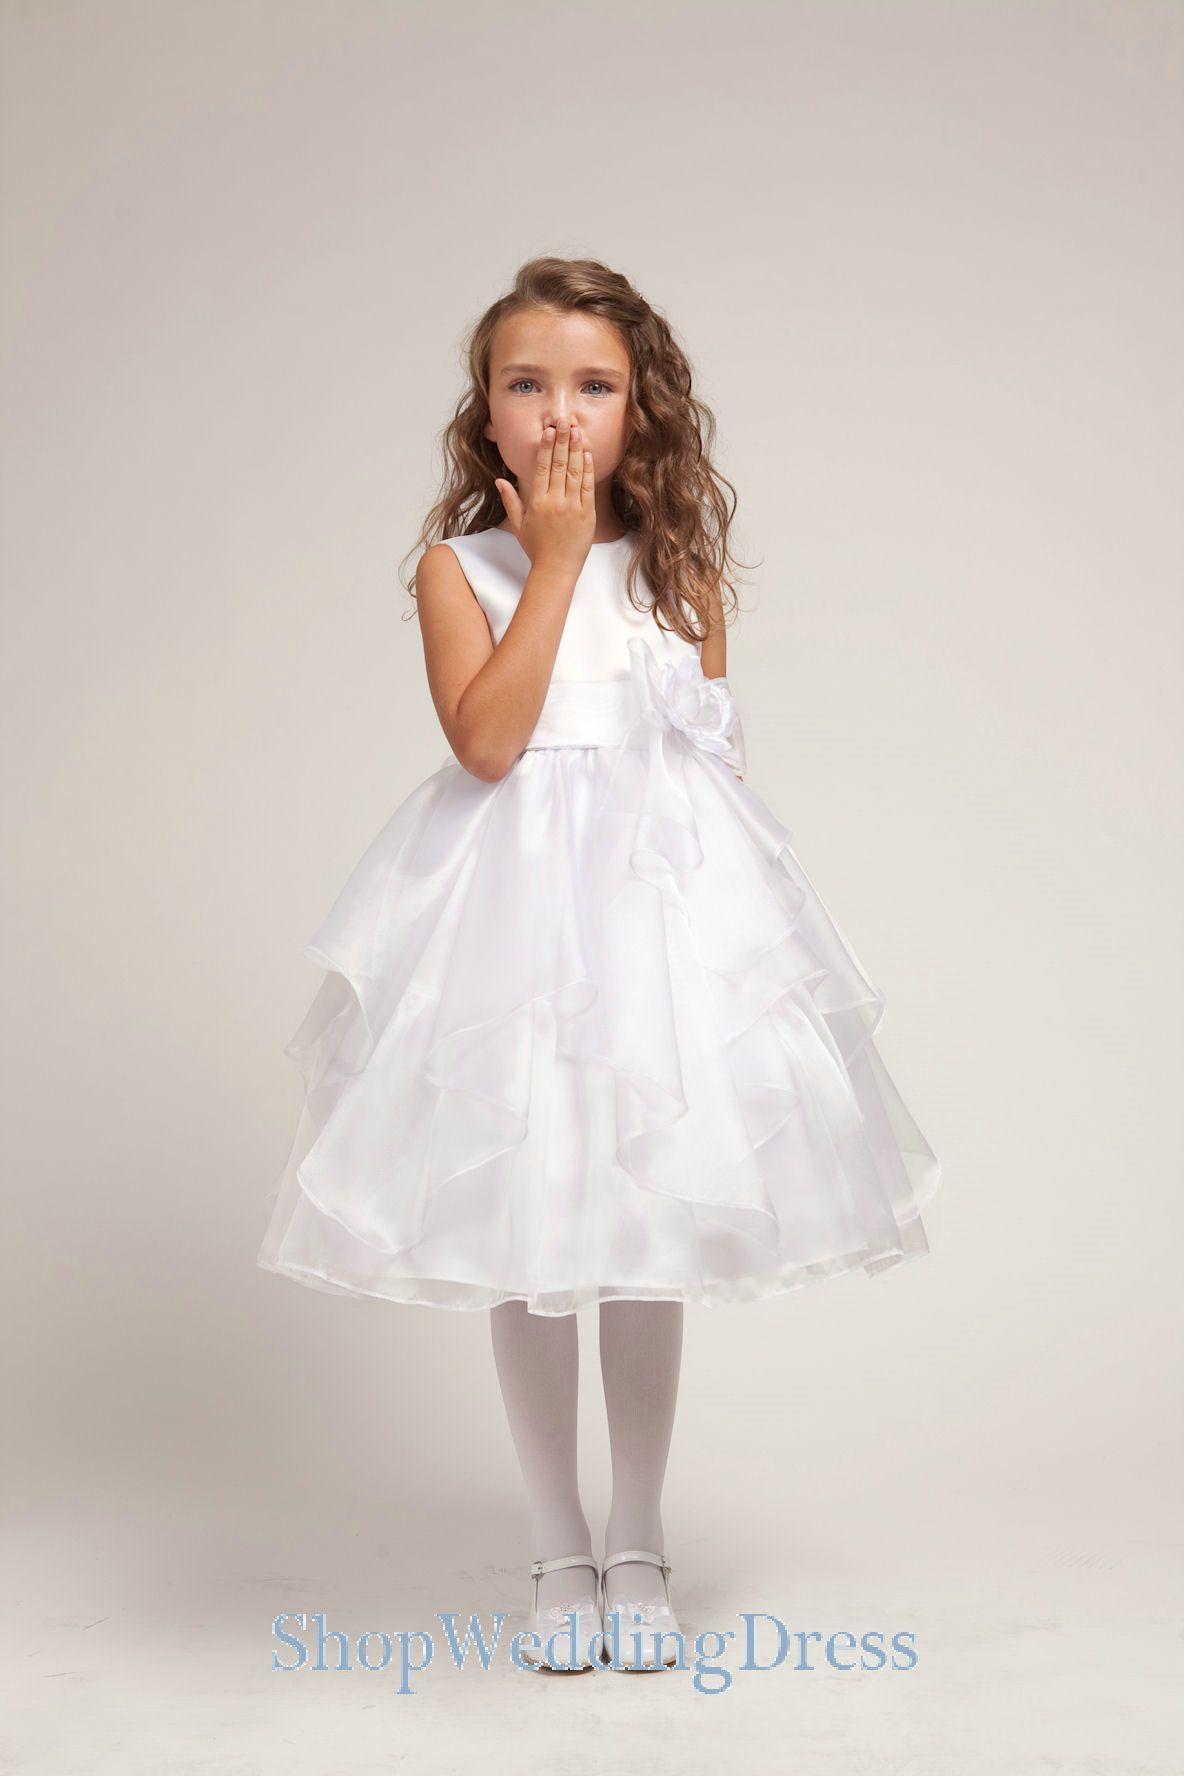 Flowing Wedding Gown Designs